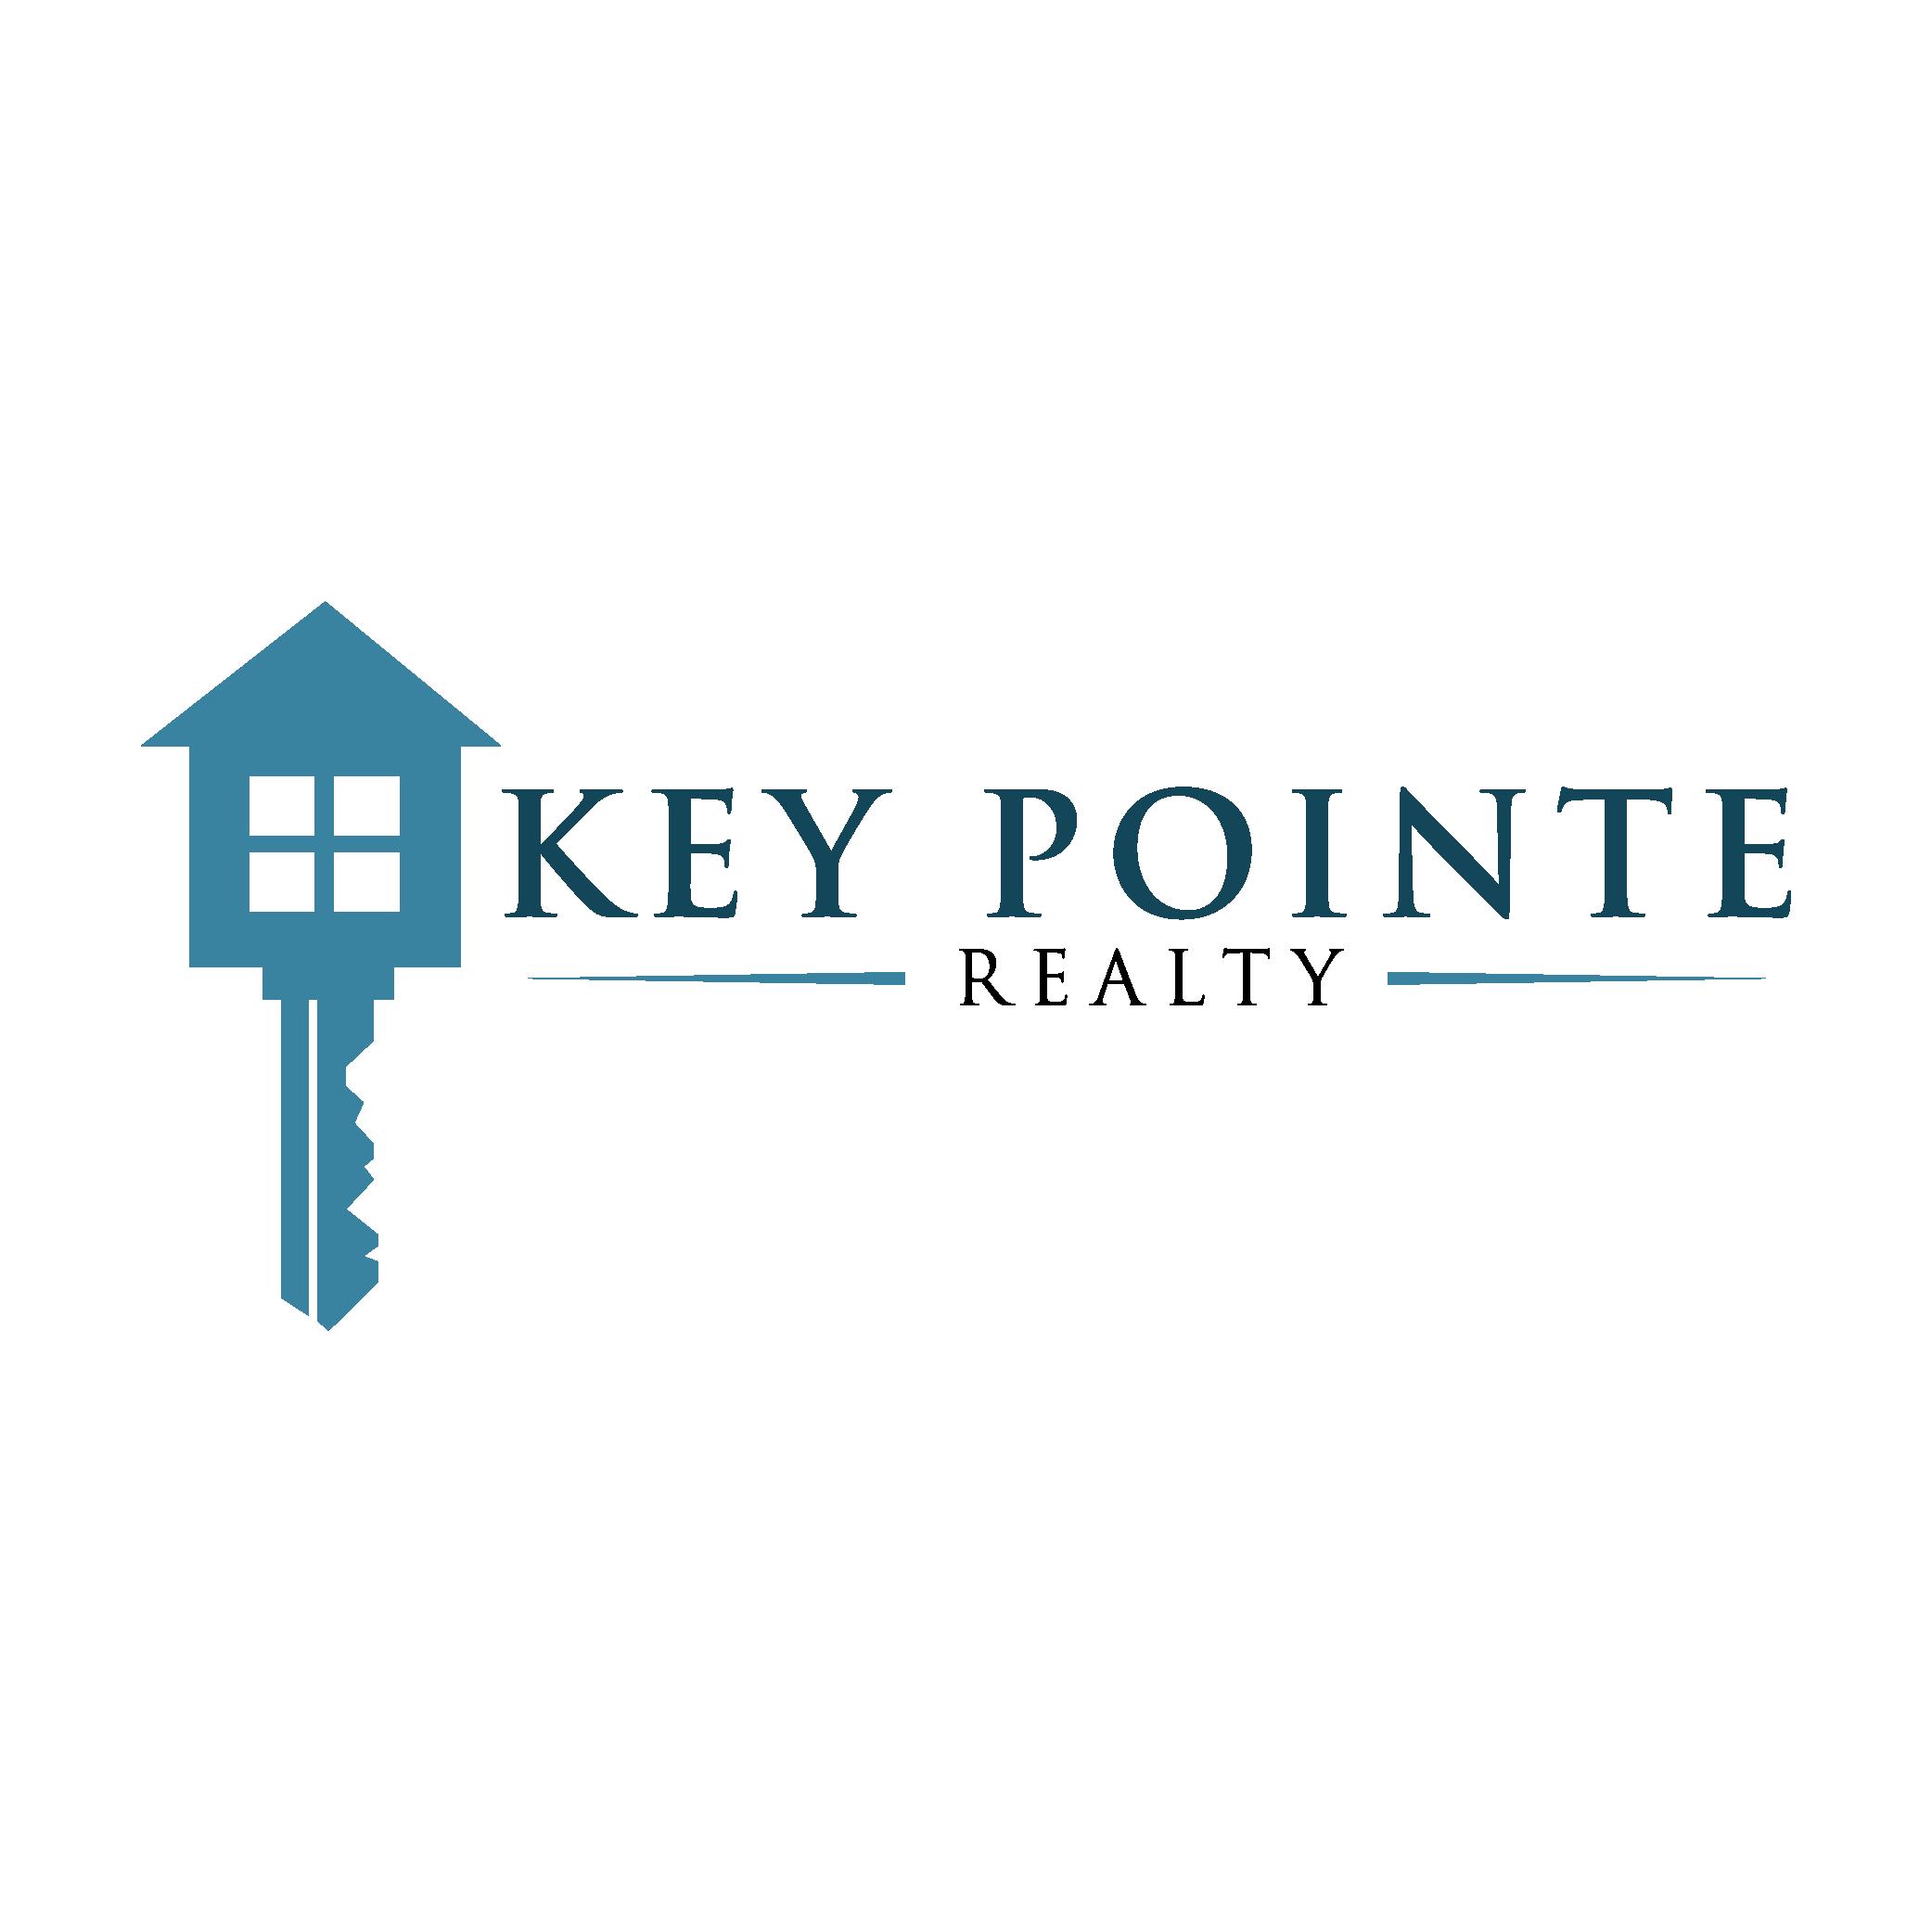 Key Pointe Realty logo